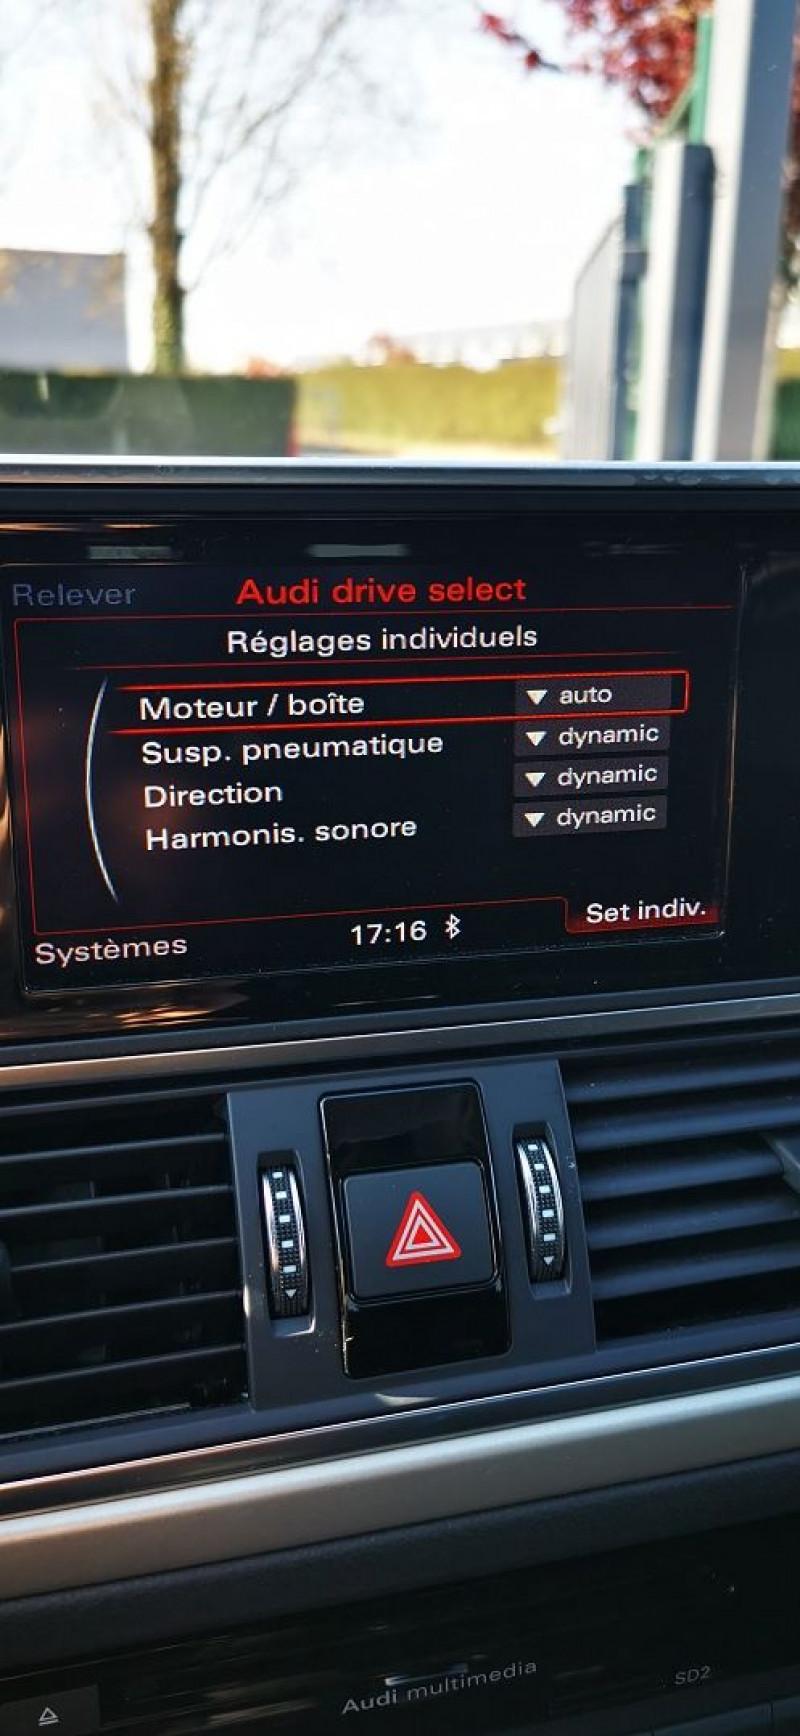 Photo 21 de l'offre de AUDI A6 ALLROAD 3.0 V6 BITDI 320CH AMBITION LUXE QUATTRO TIPTRONIC à 41490€ chez Maximum Automobiles